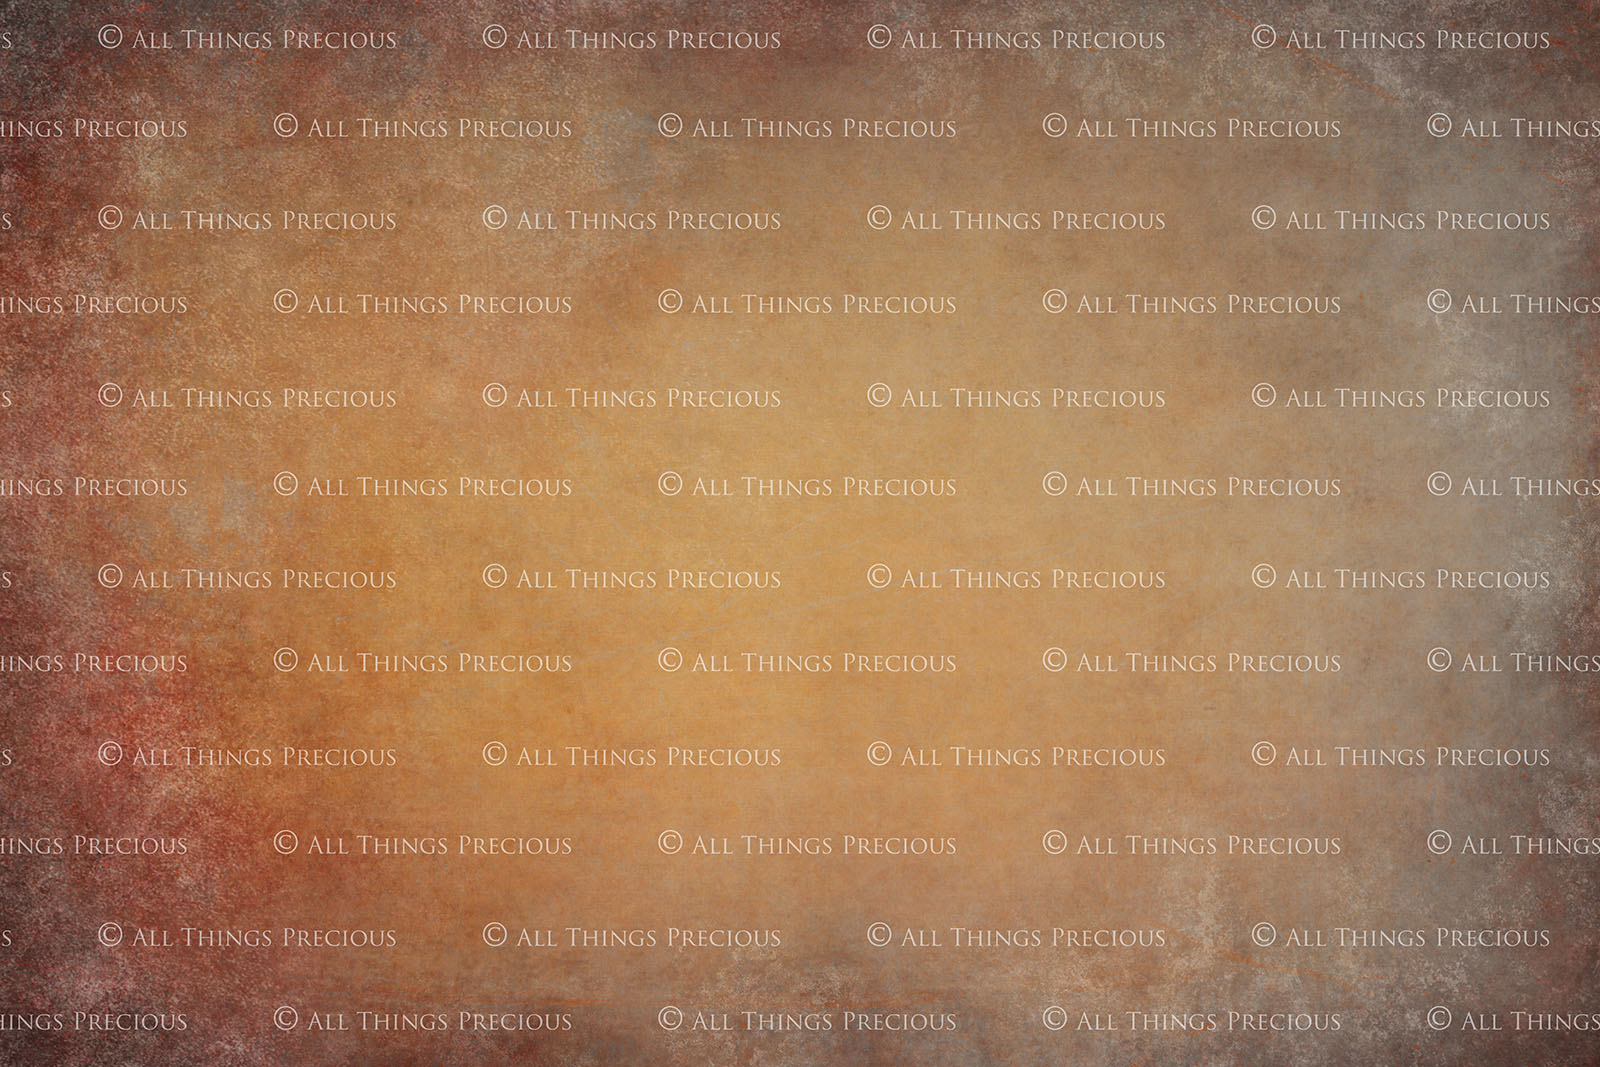 10 Fine Art BERRIES & CREAM Textures SET 1 example image 2